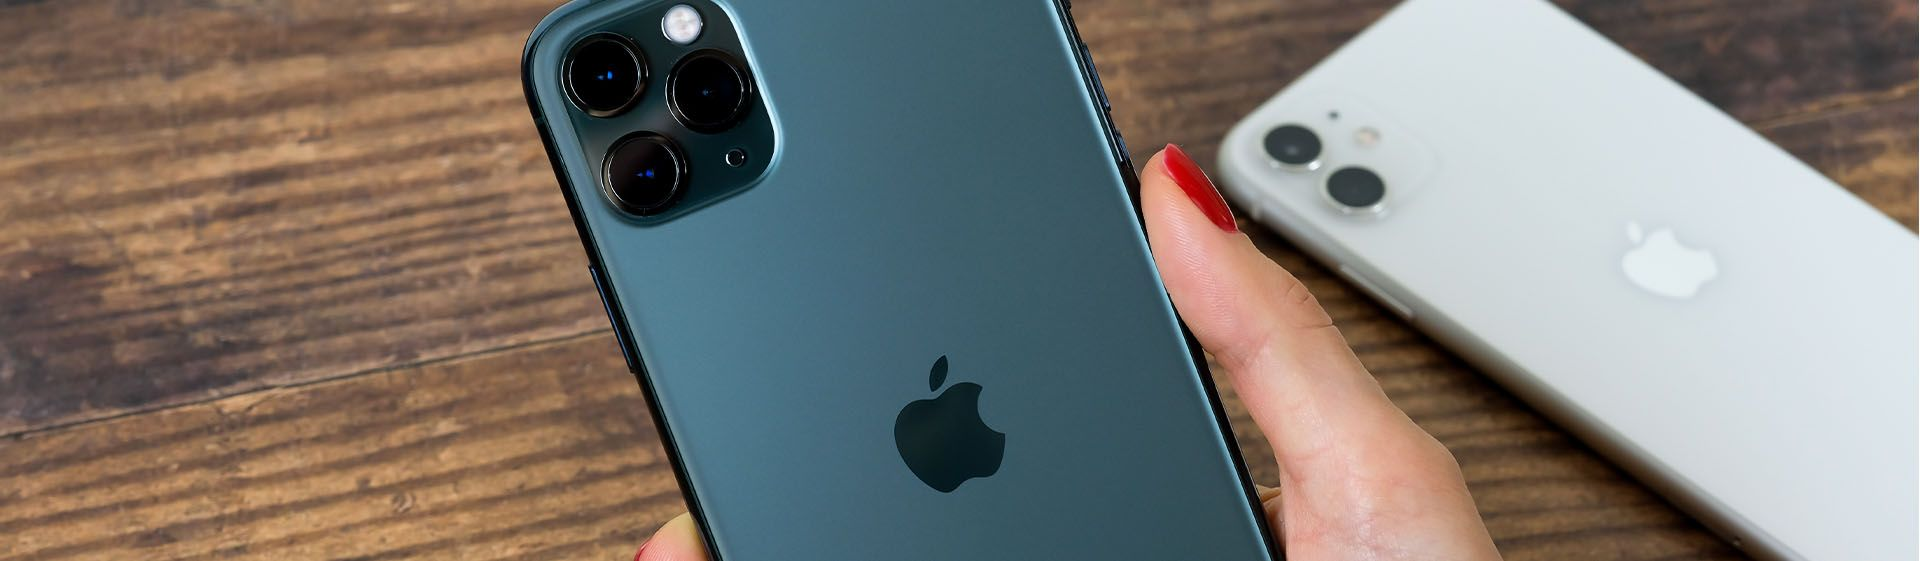 Qual iPhone comprar em 2020?